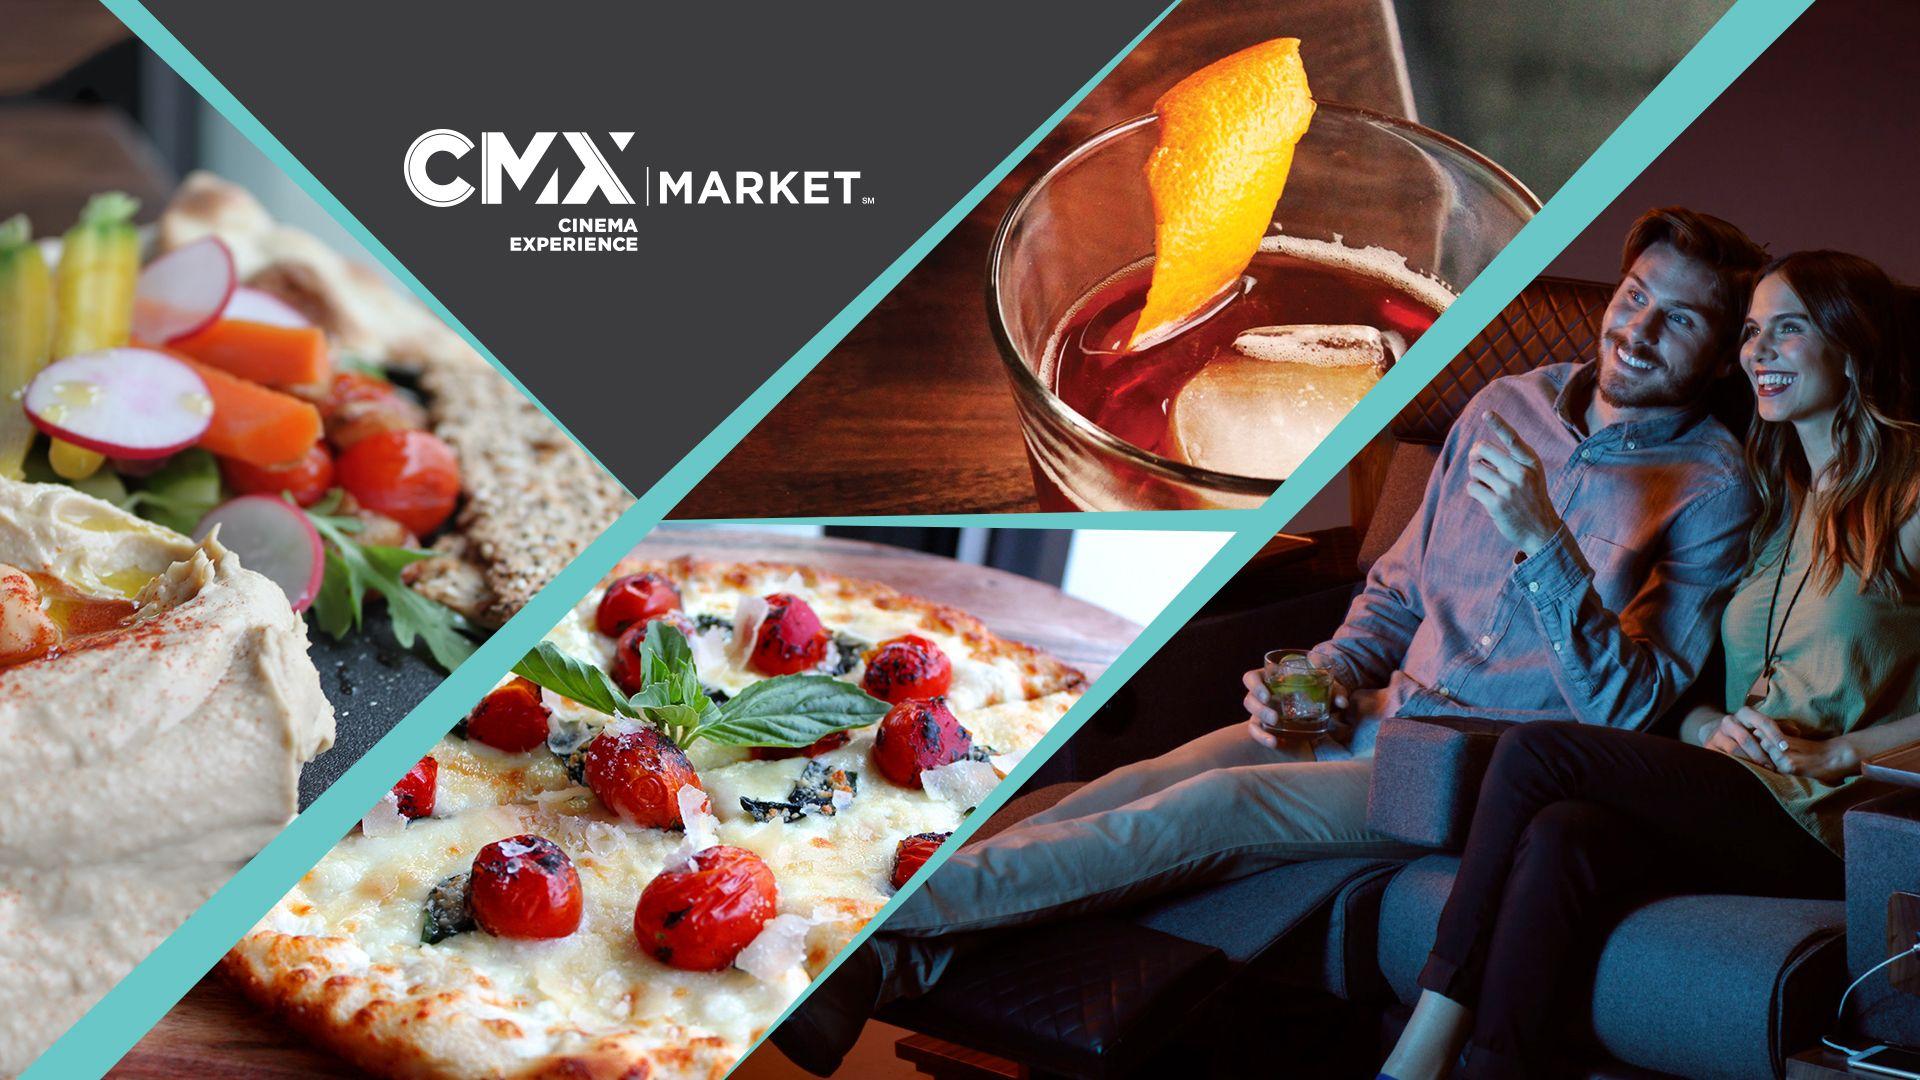 Cmx market cinema experience cinema experience mall of